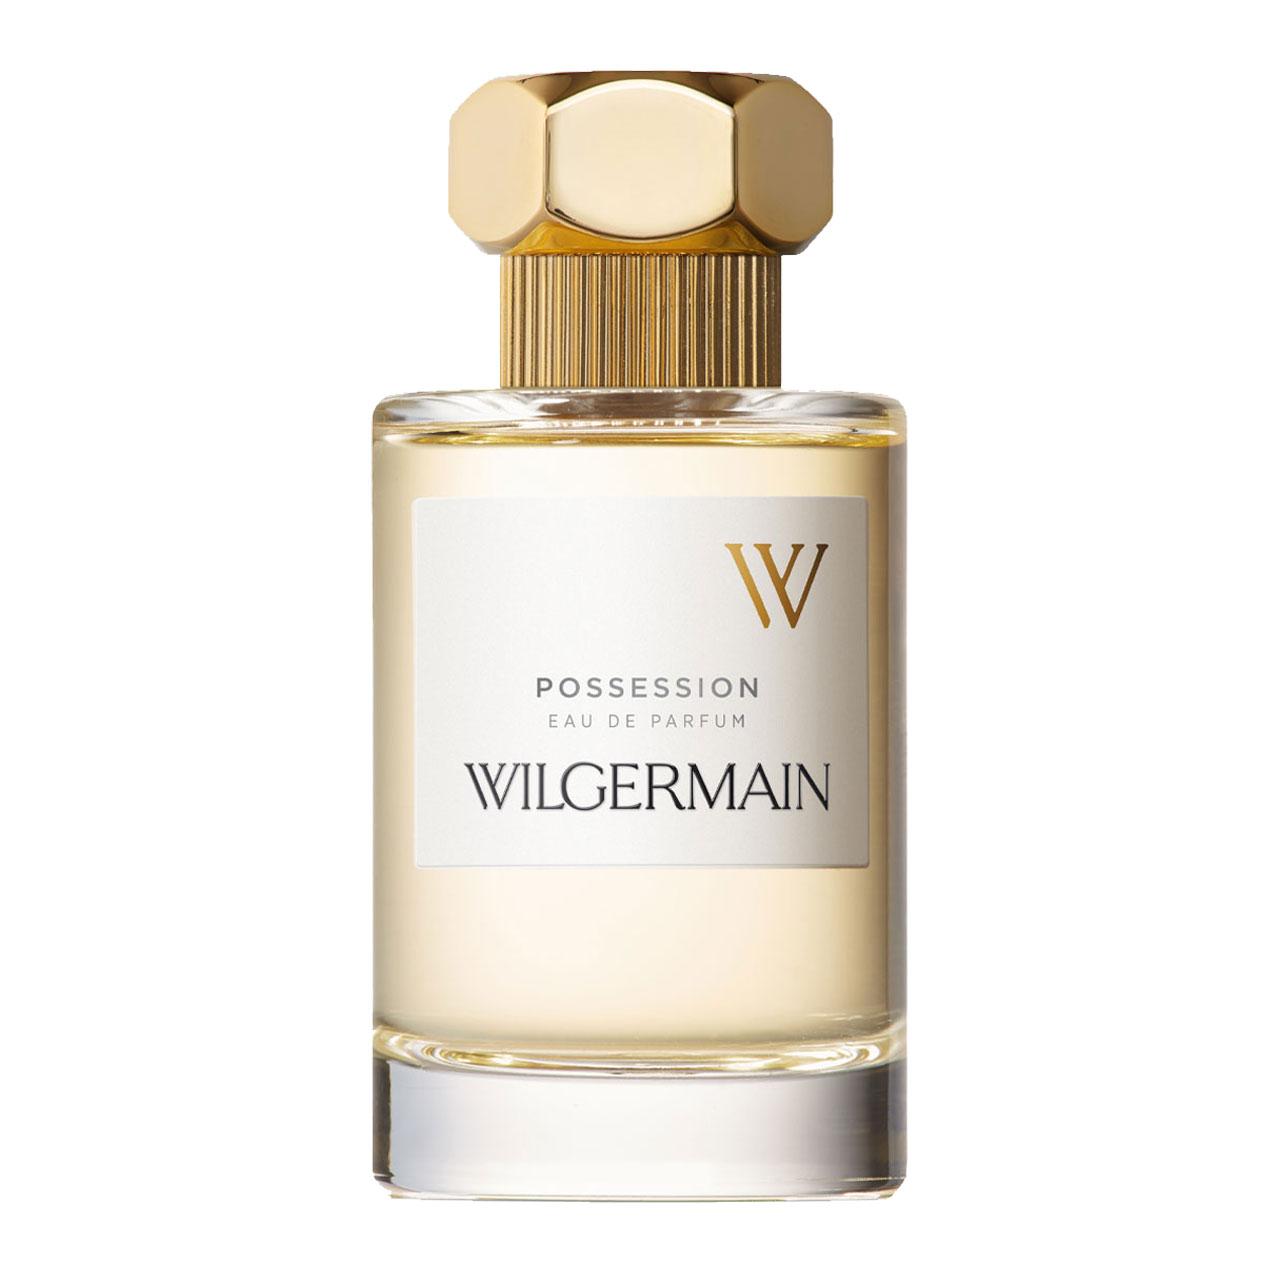 Wilgermain Possession